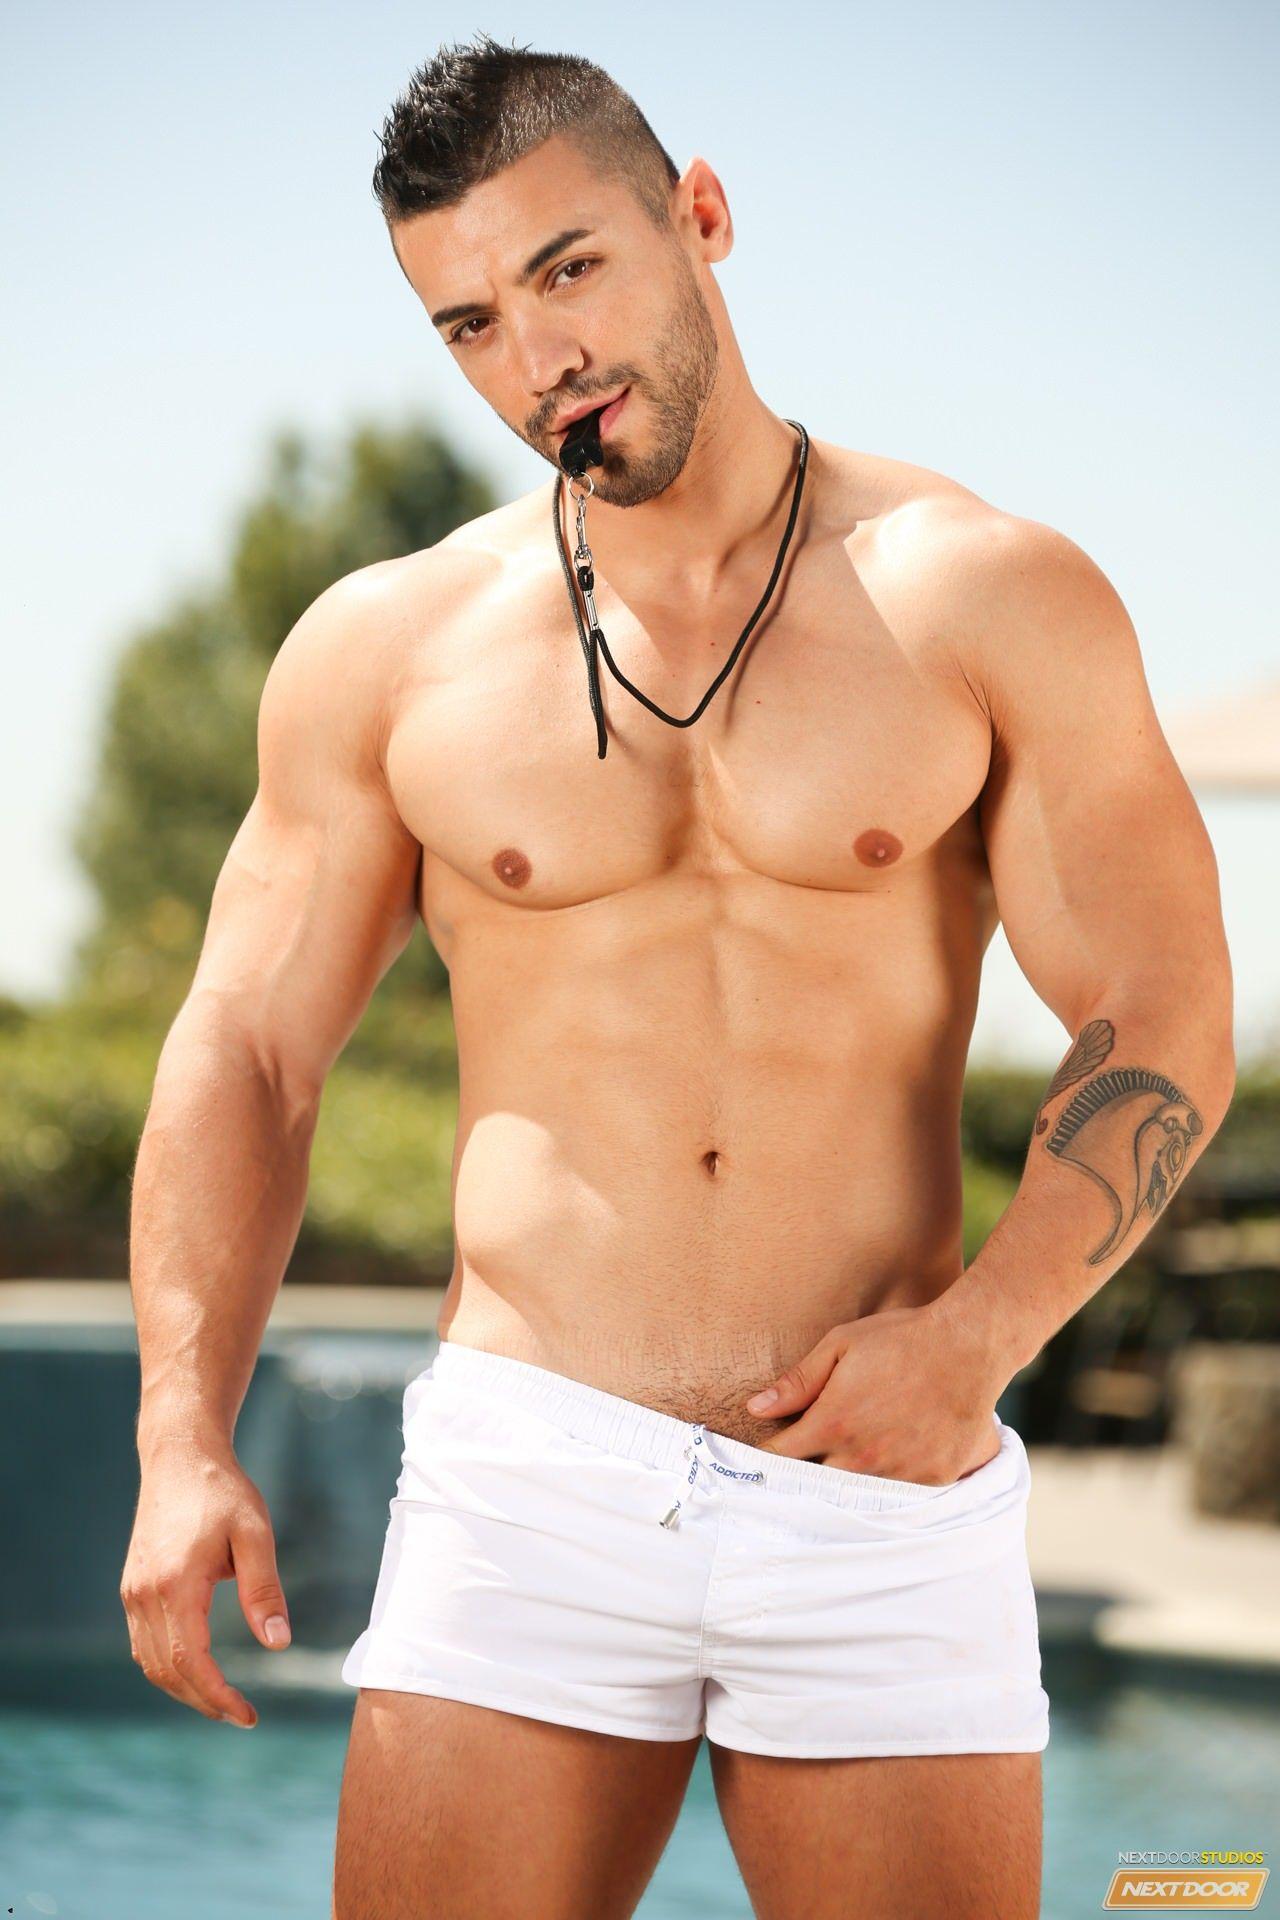 Erotic body parts